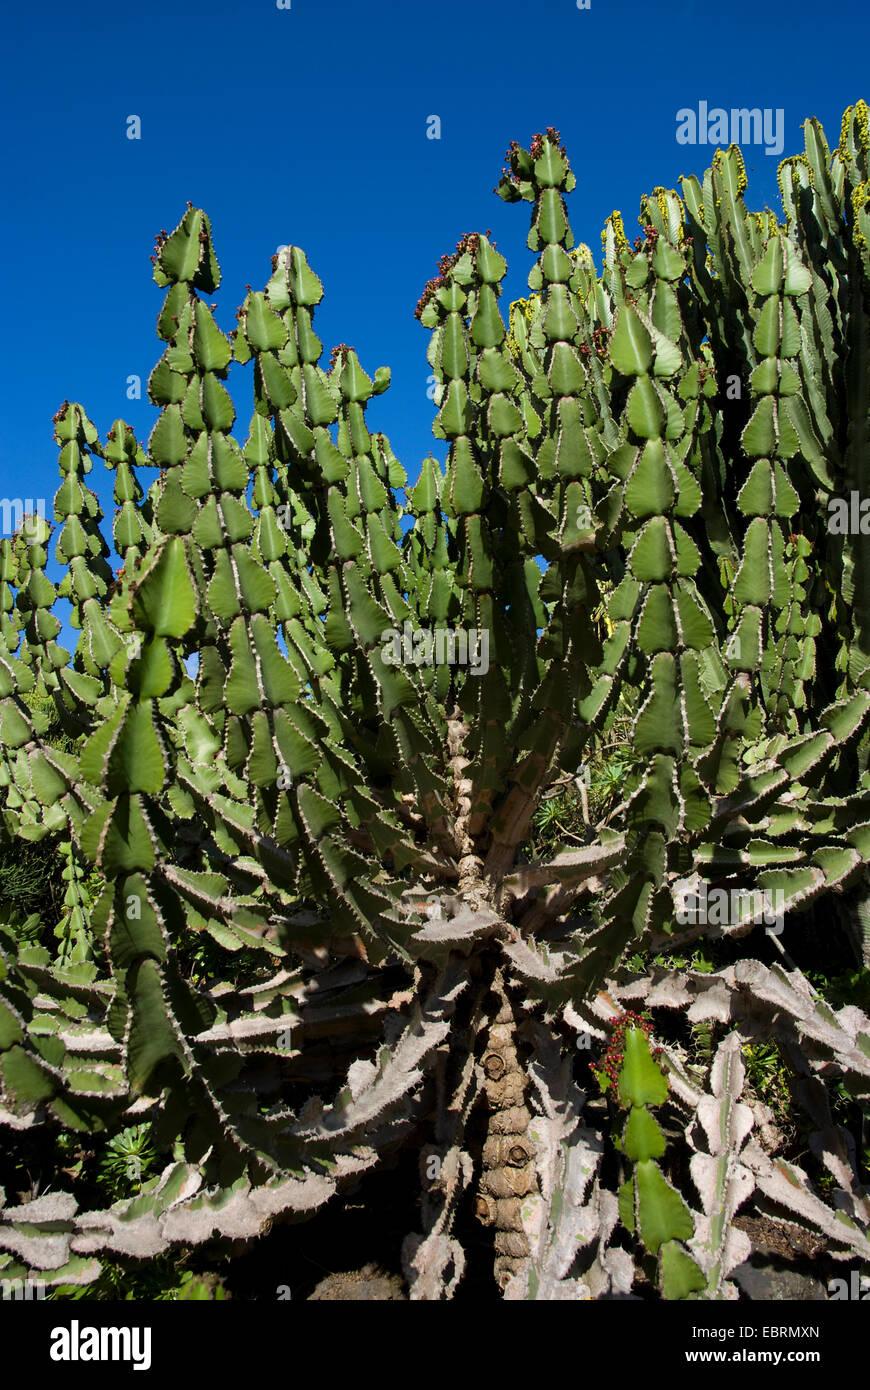 Transvaal caldelabra tree (Euphorbia cooperi), Canary Islands, Gran Canaria - Stock Image